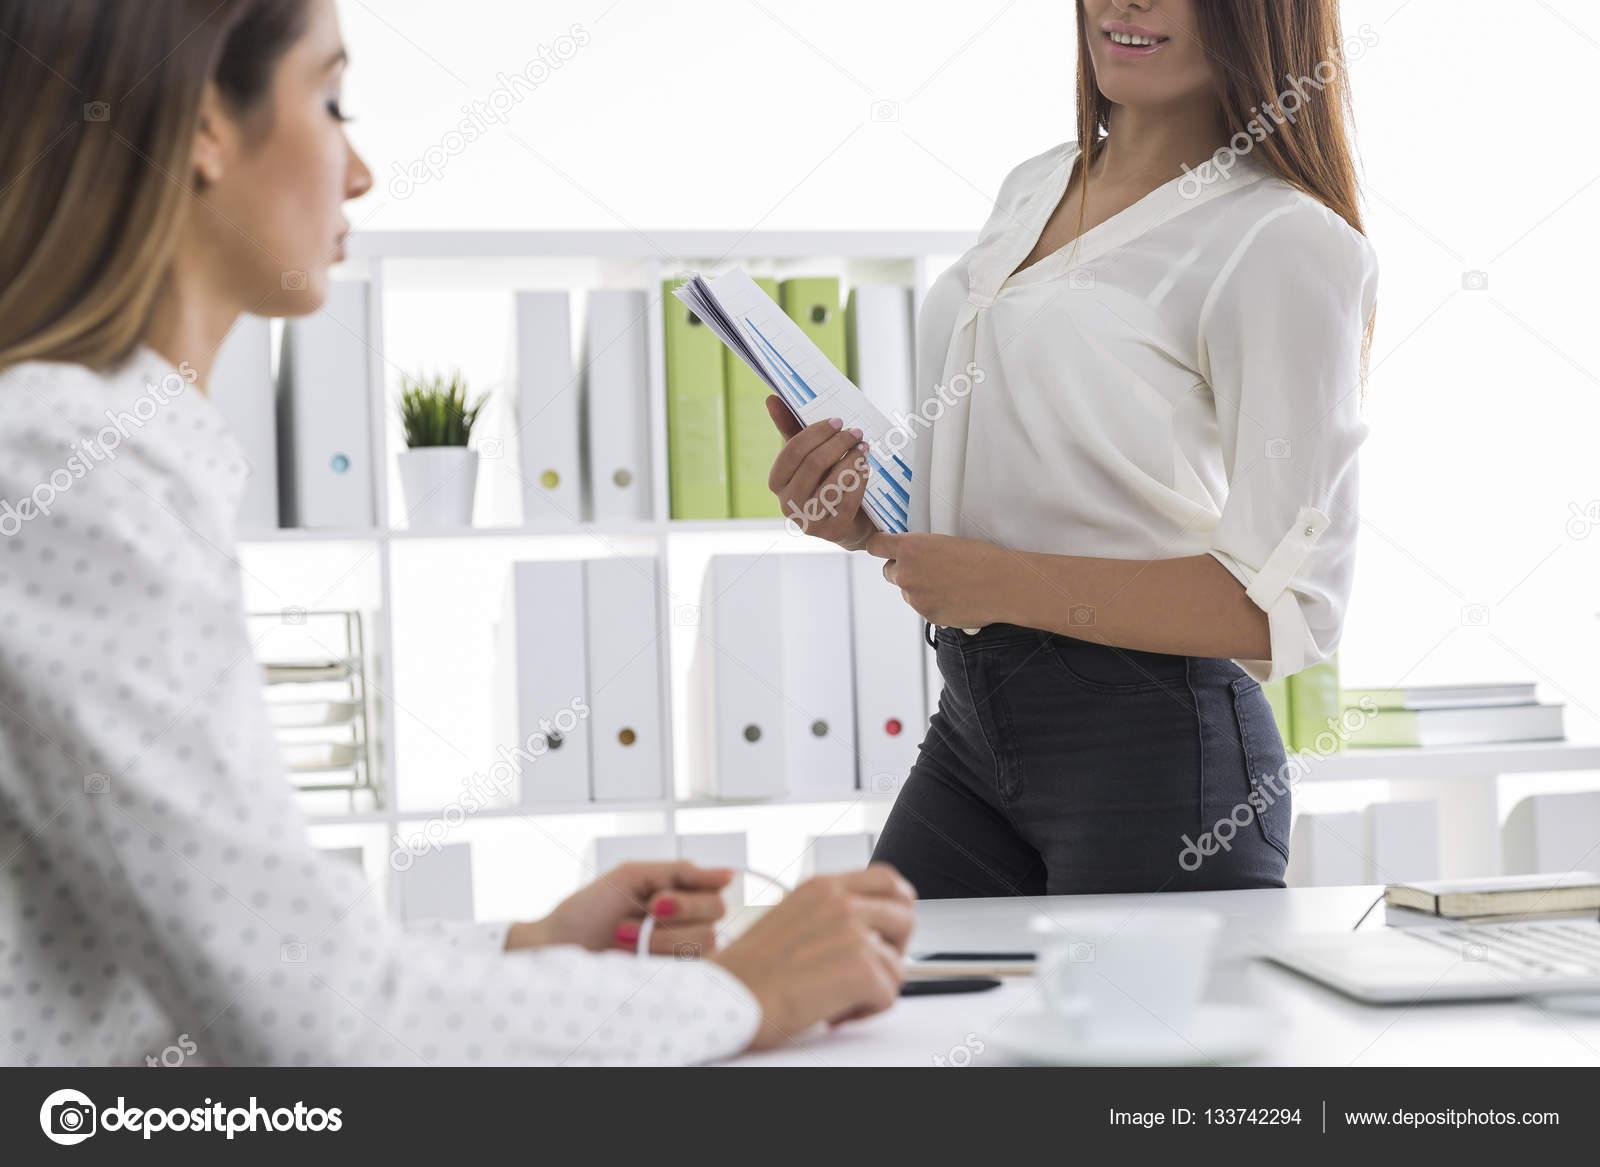 35265072f612 Δύο γυναίκες σε λευκές μπλούζες εργάζονται σε ένα γραφείο– εικόνα αρχείου